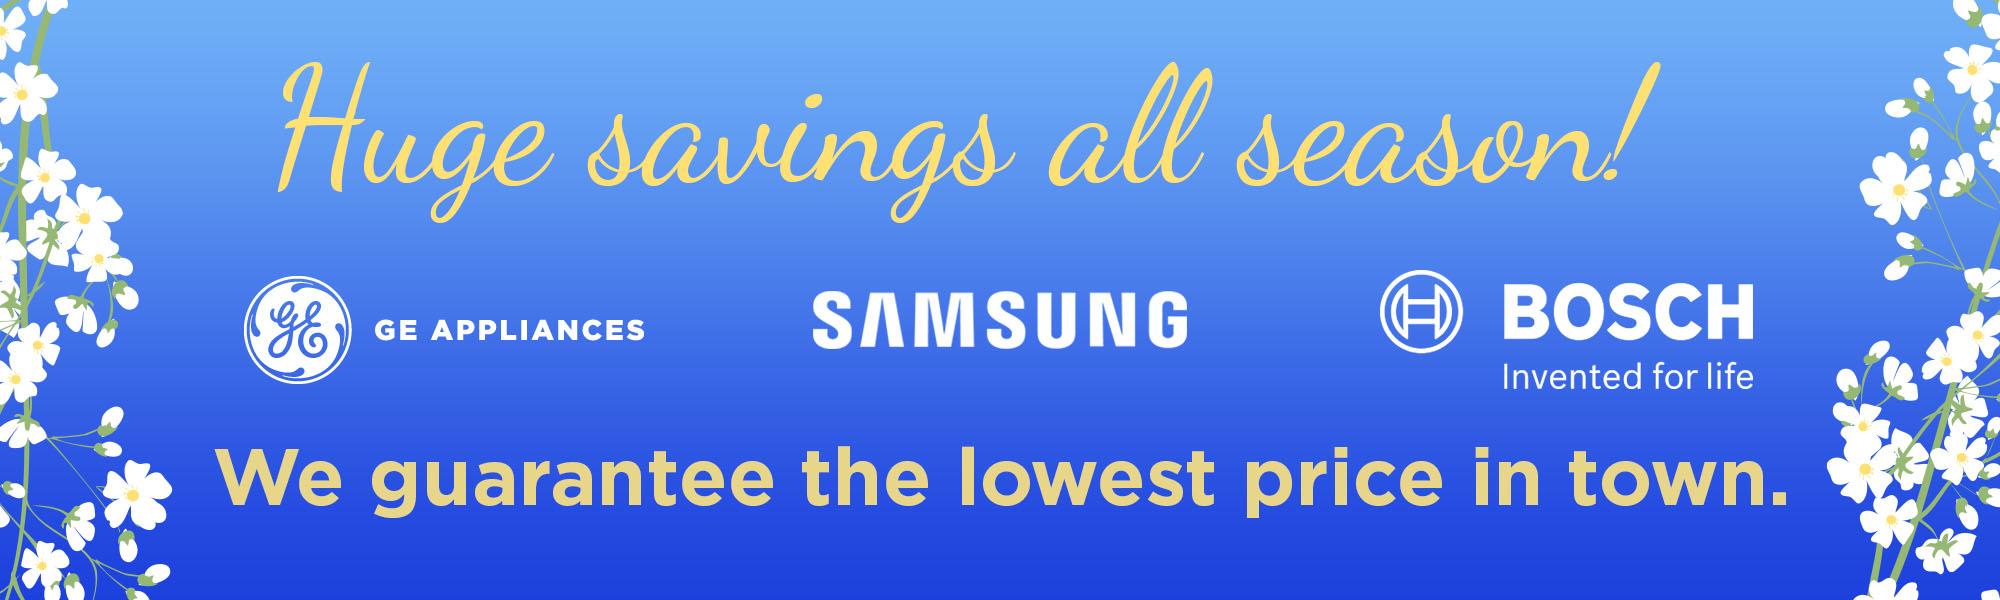 Huge spring savings - GE, Samsung and Bosch